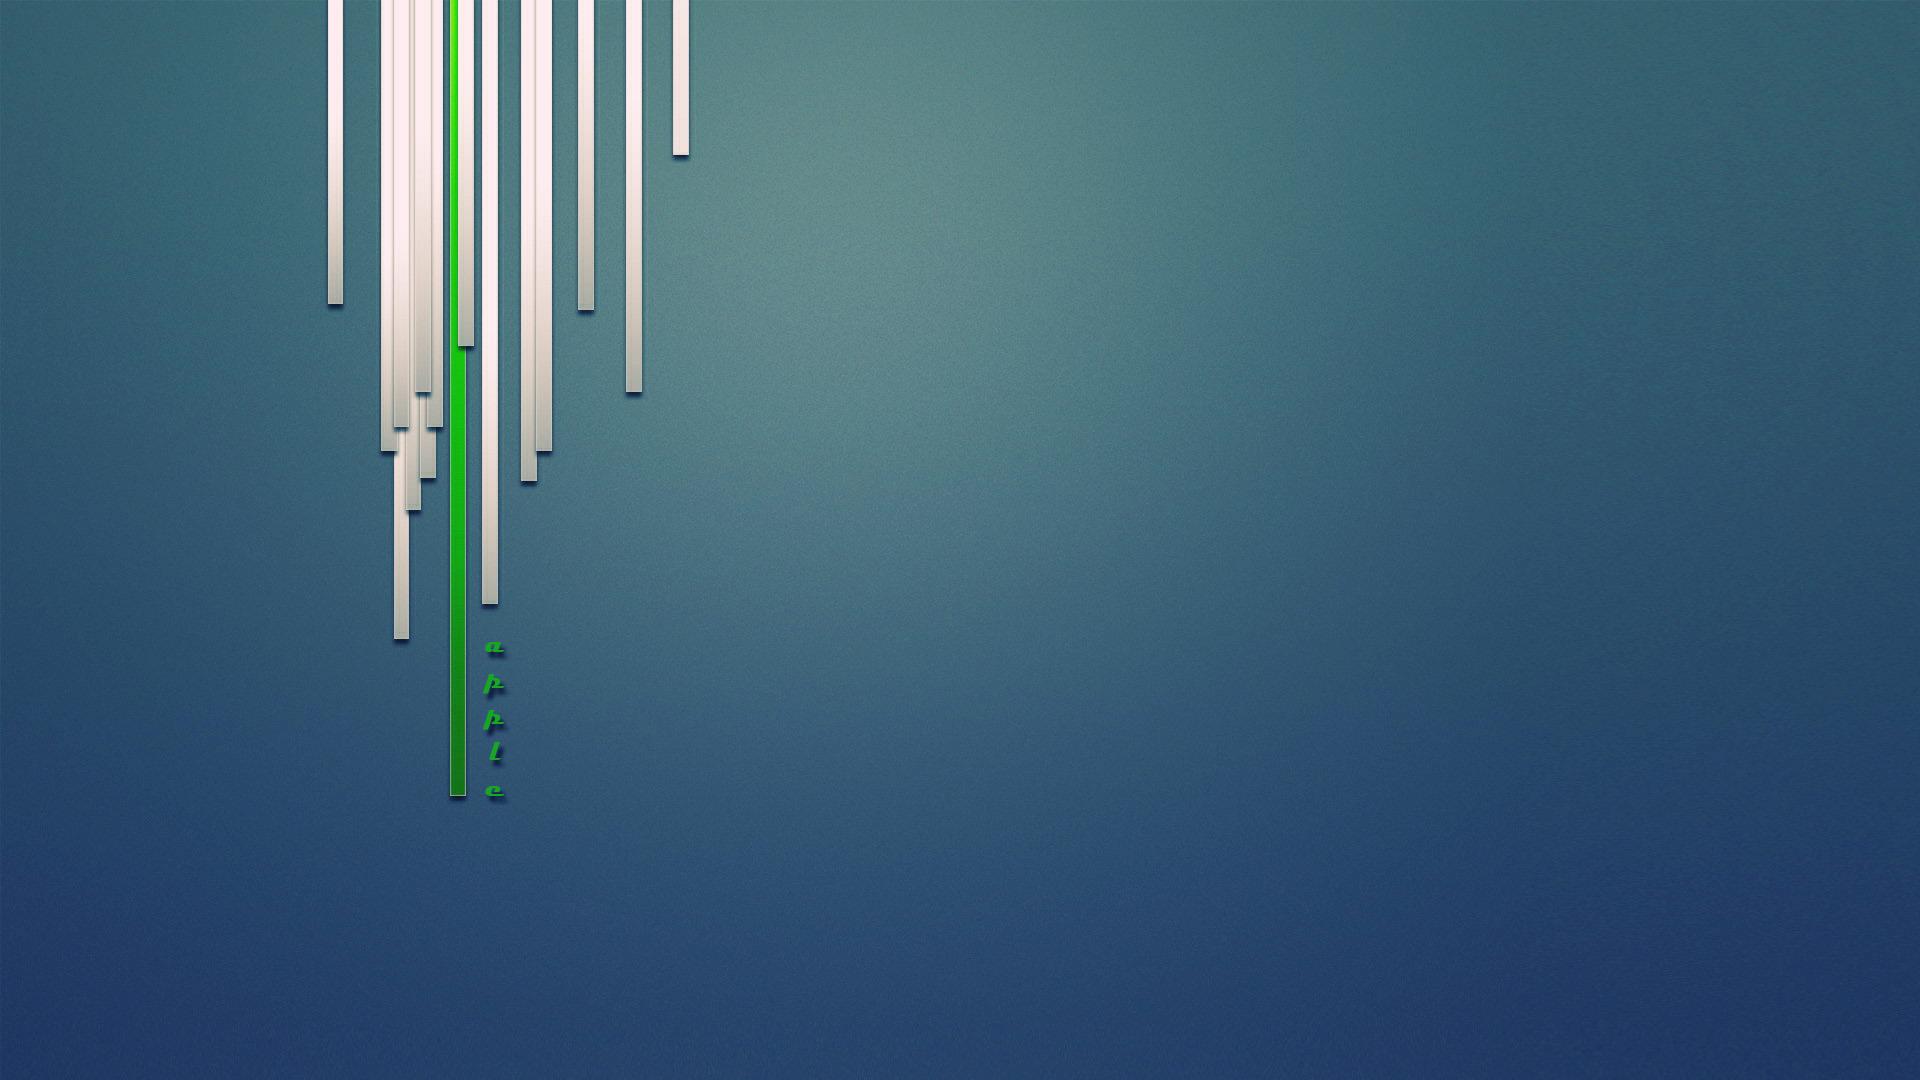 1920x1080 Network in Green desktop PC and Mac wallpaper